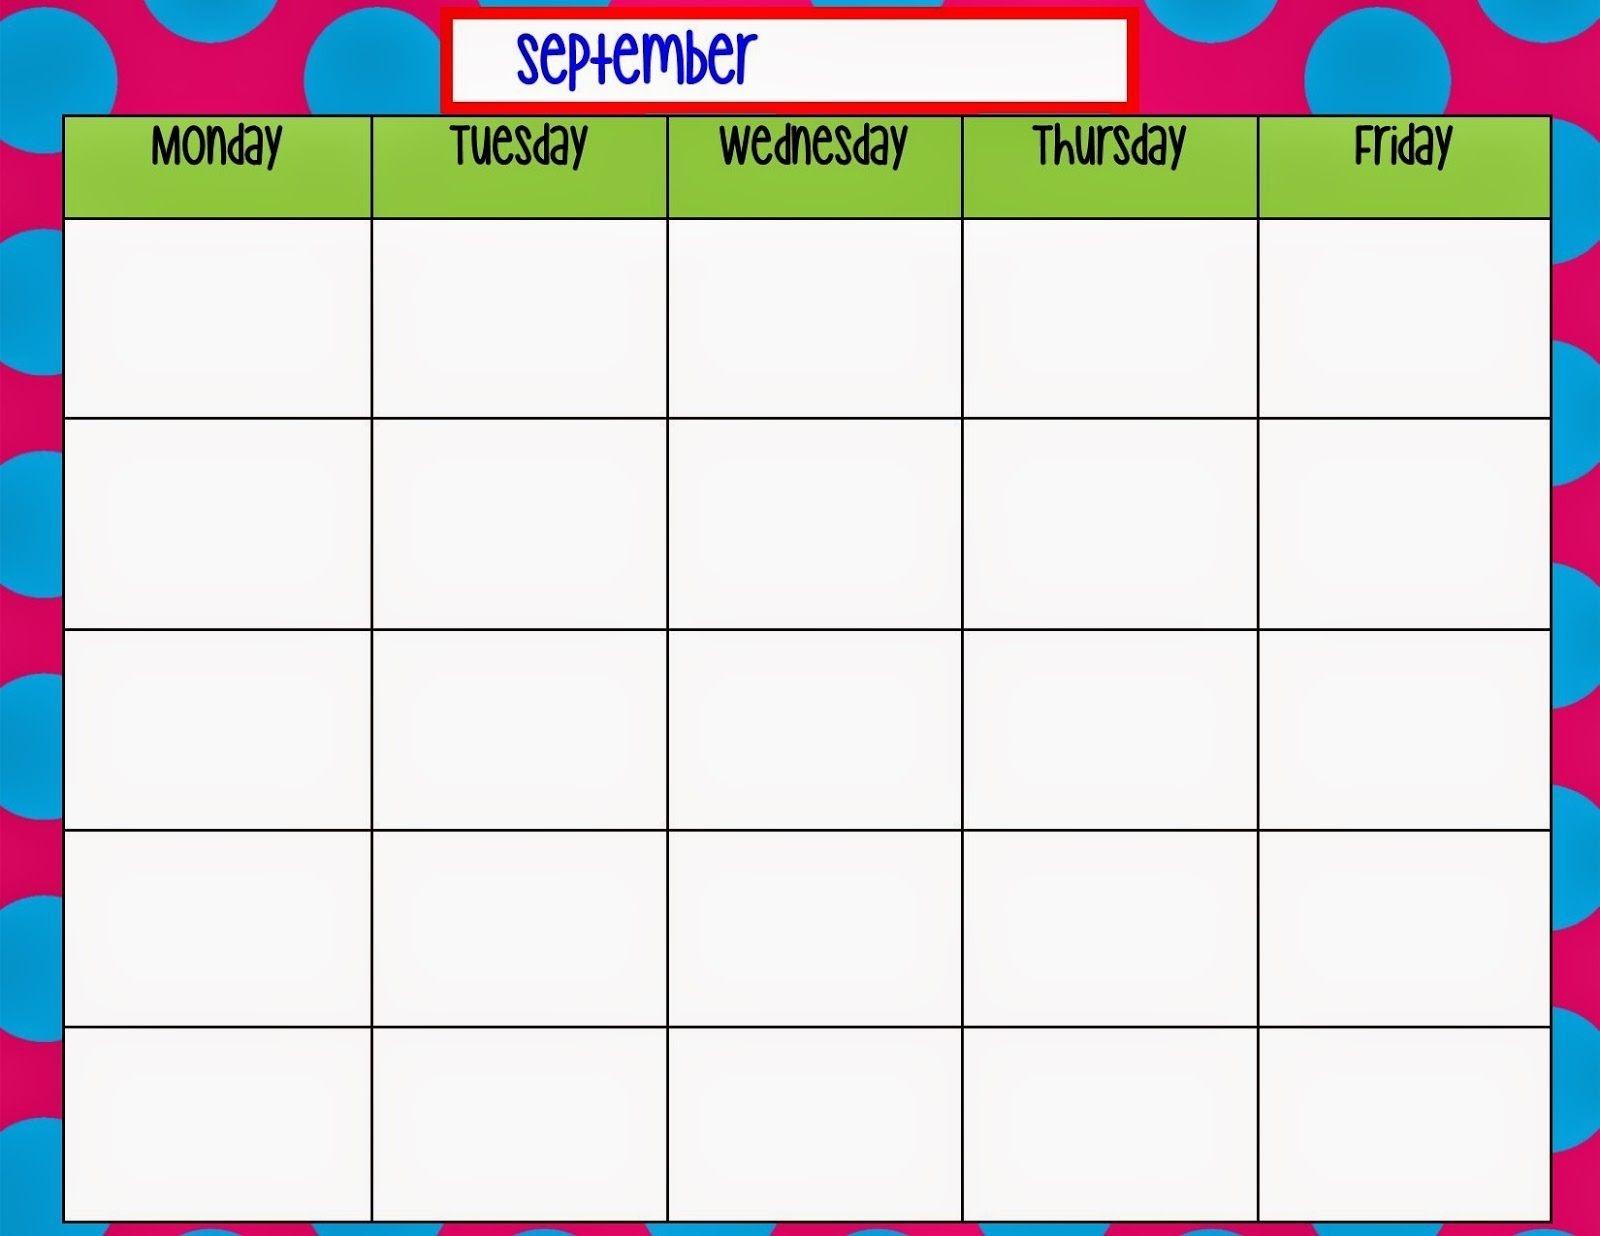 Monday Through Friday Calendar Template | Weekly Calendar-Monday To Friday Word Template